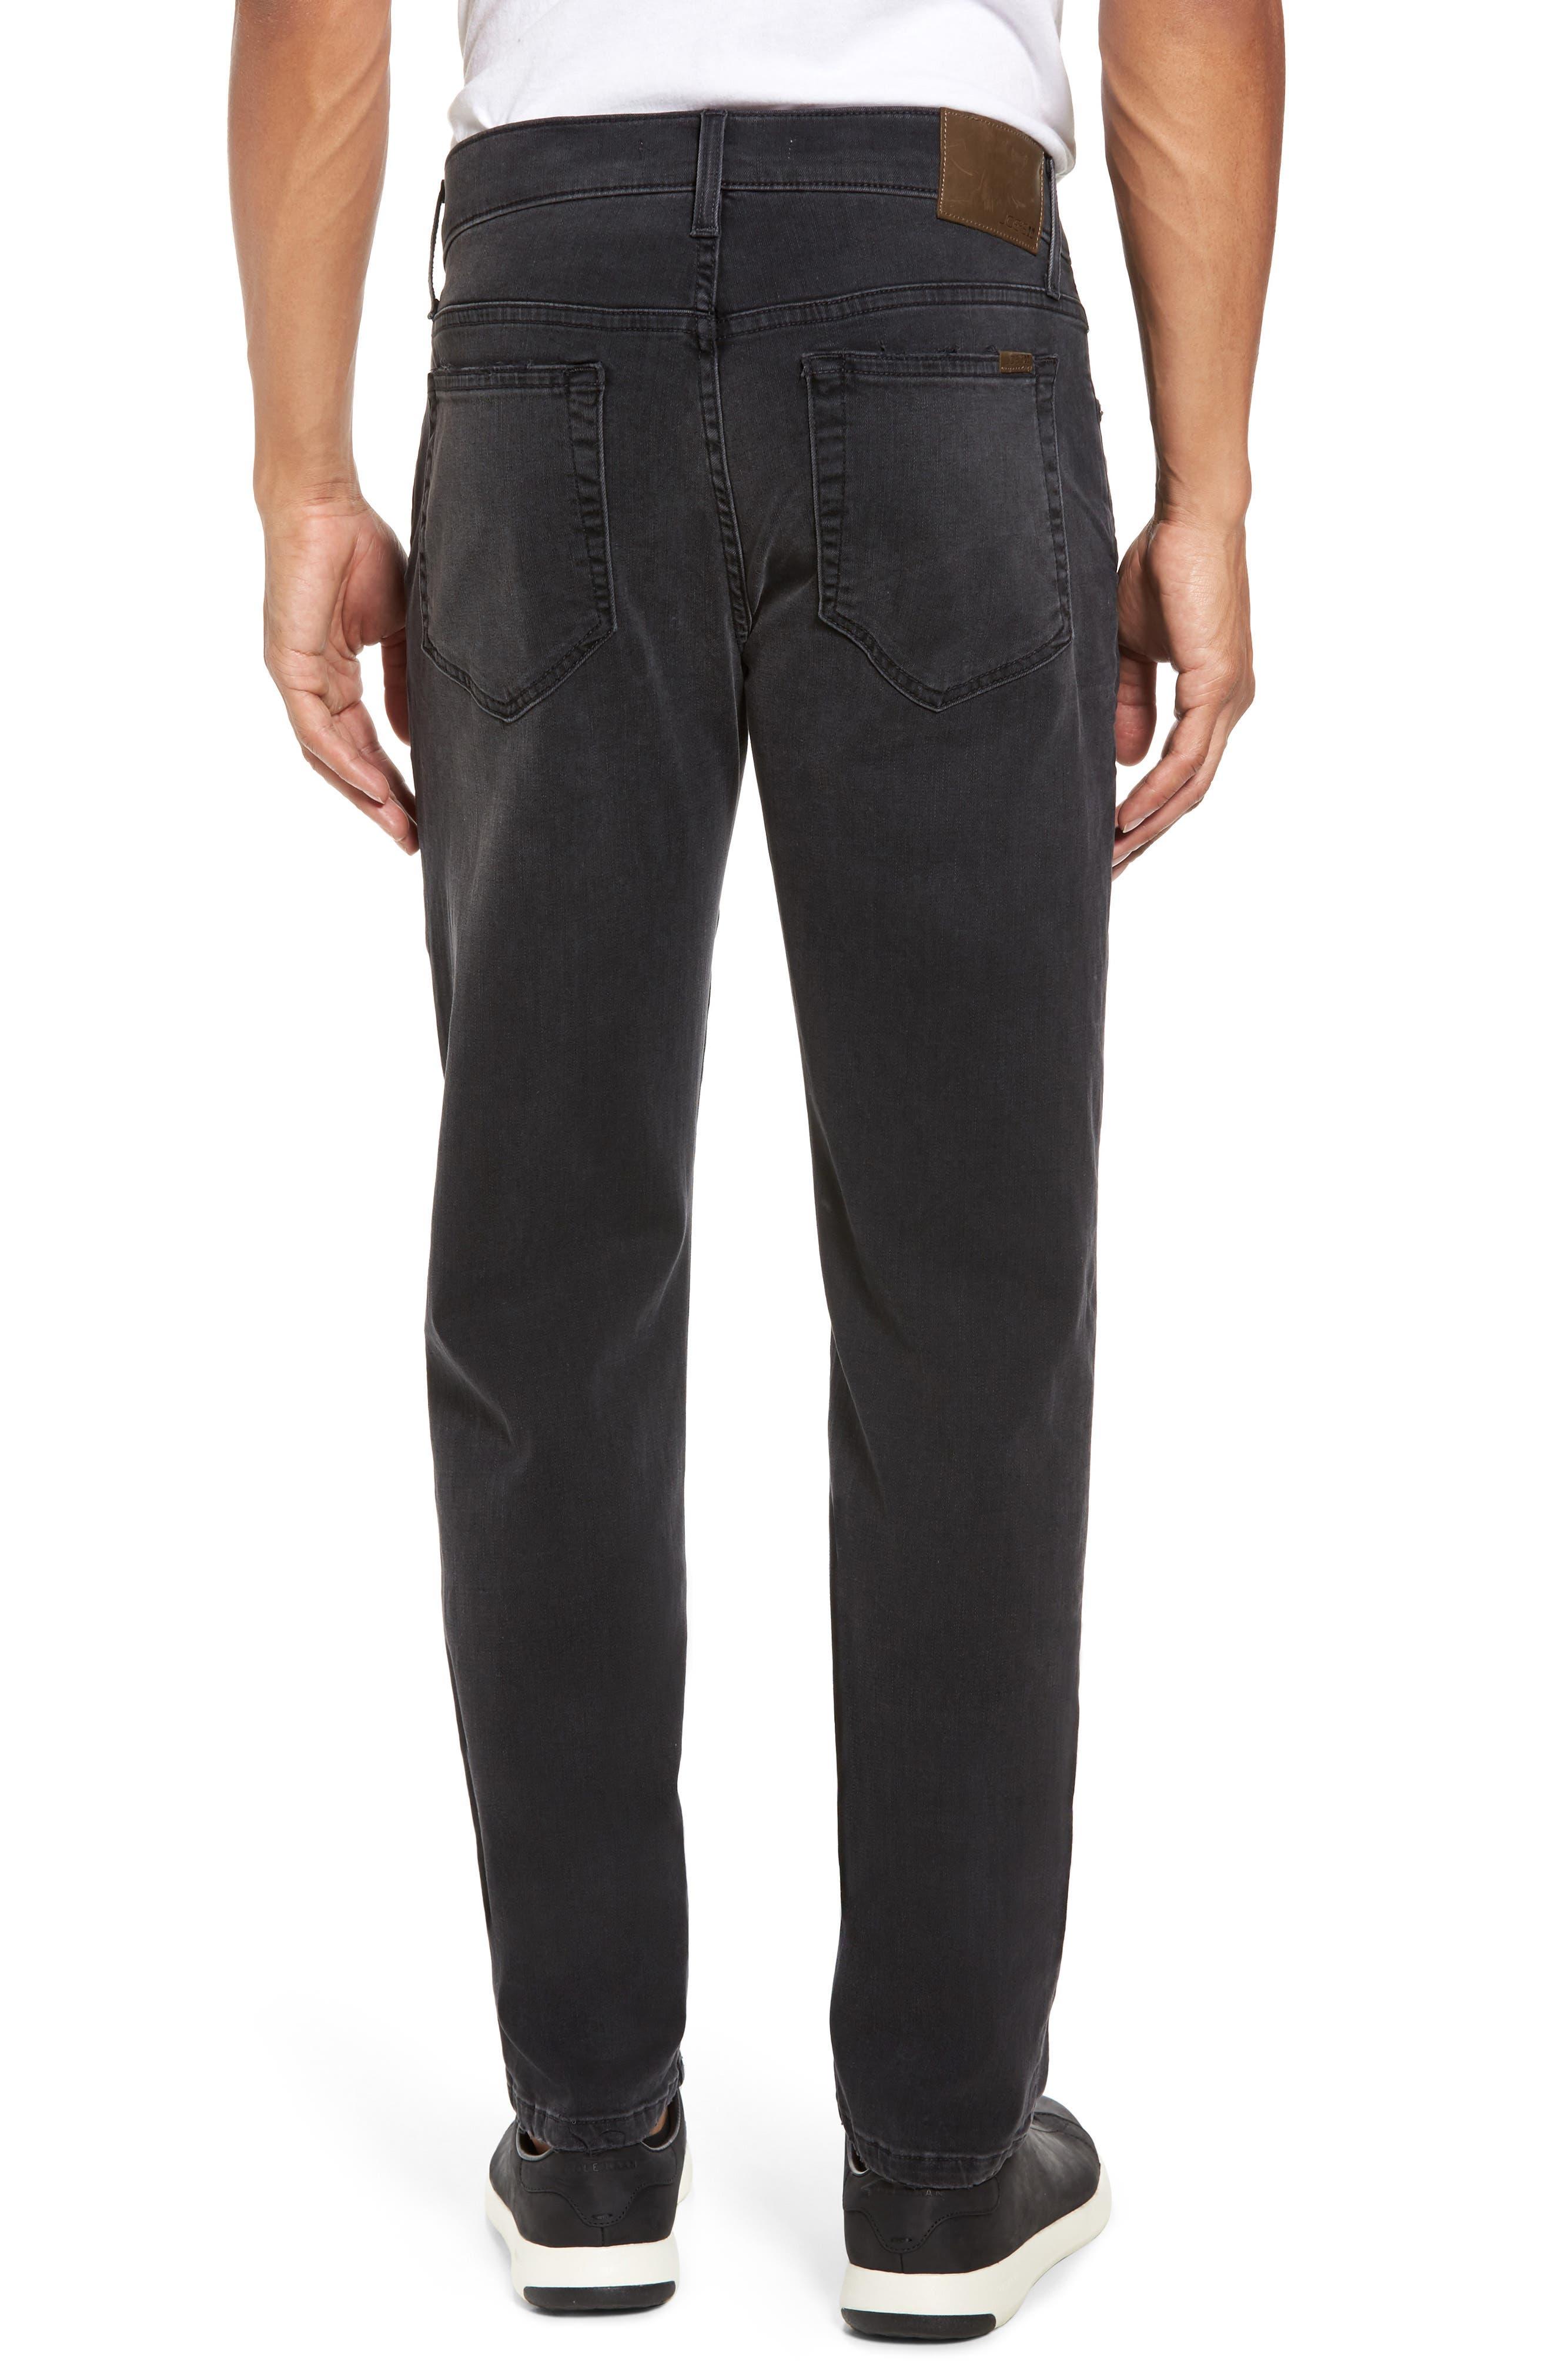 Brixton Slim Straight Fit Jeans,                             Alternate thumbnail 2, color,                             015